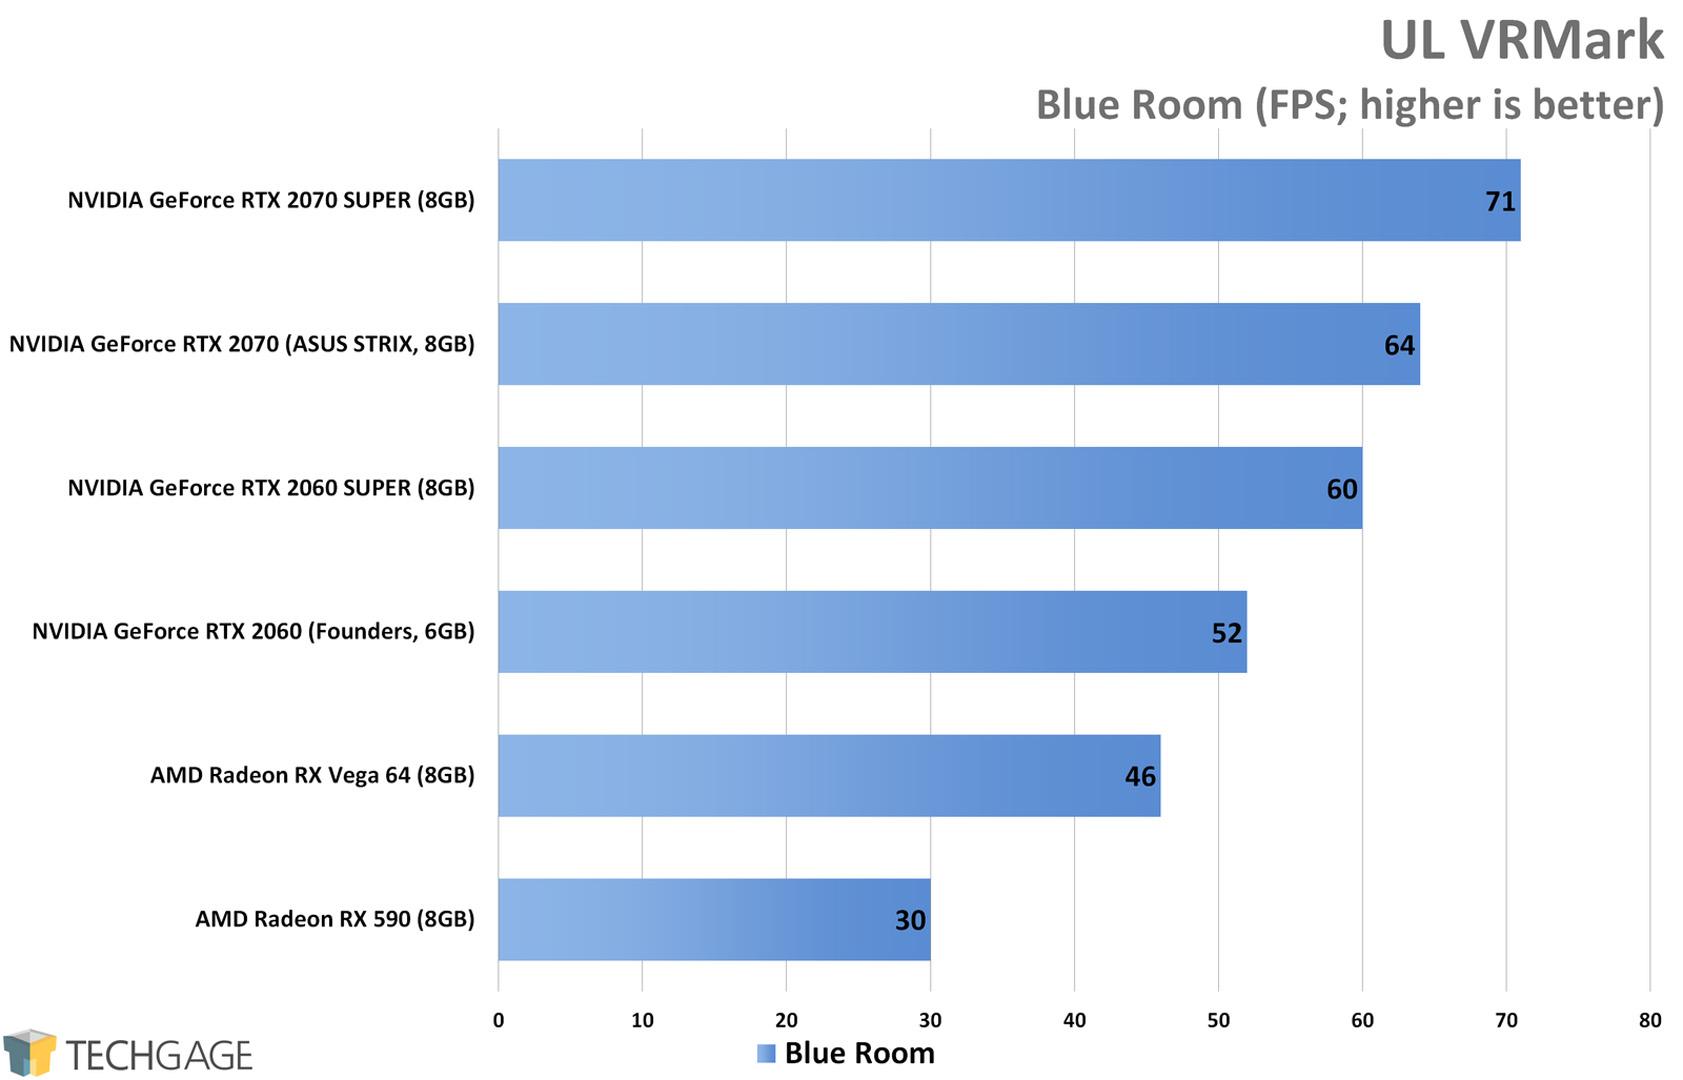 UL VRMark (Blue Room) - NVIDIA RTX SUPER 2060 and 2070 Performance